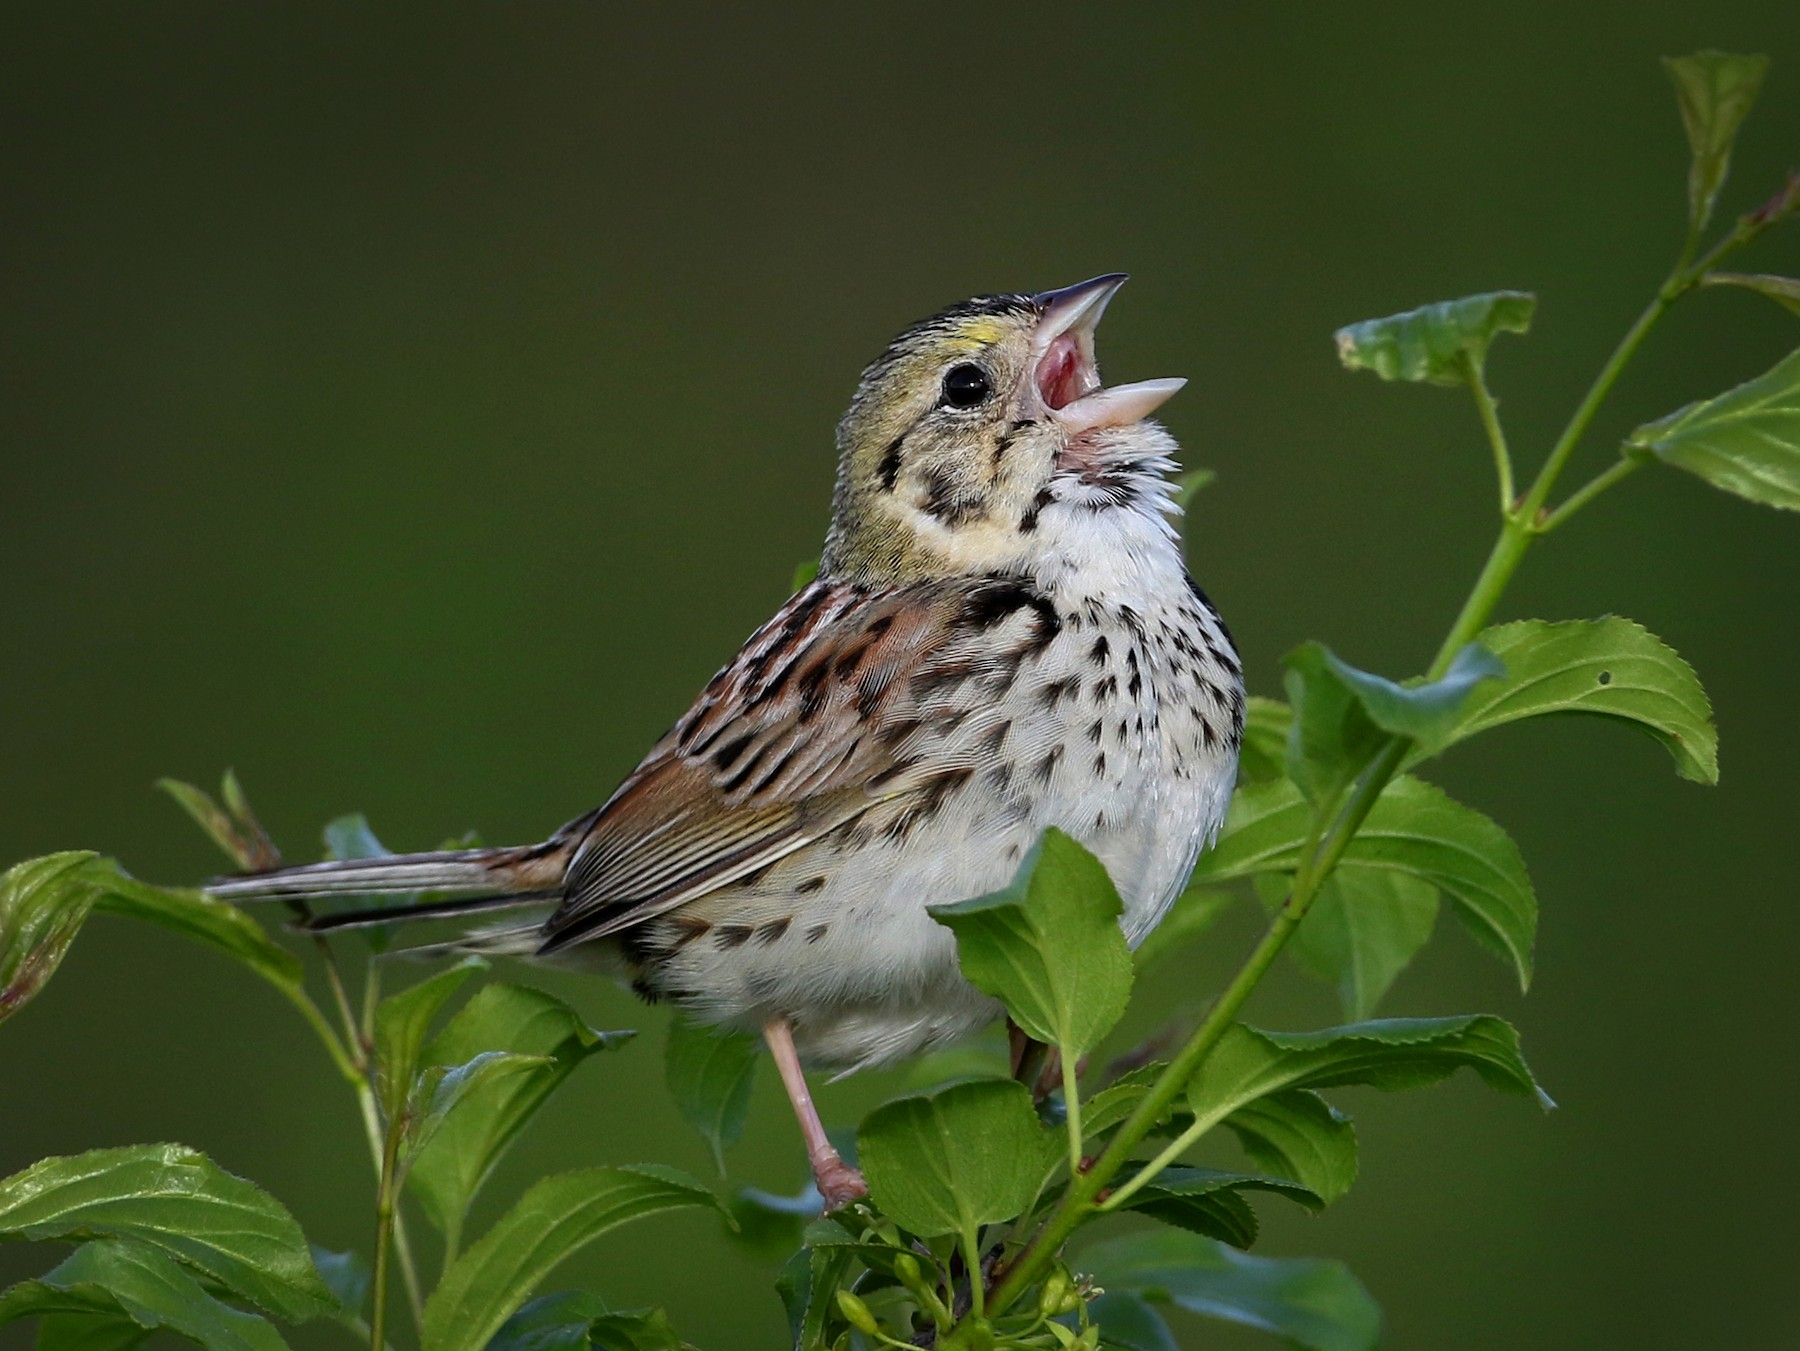 Henslow's Sparrow - Jay McGowan